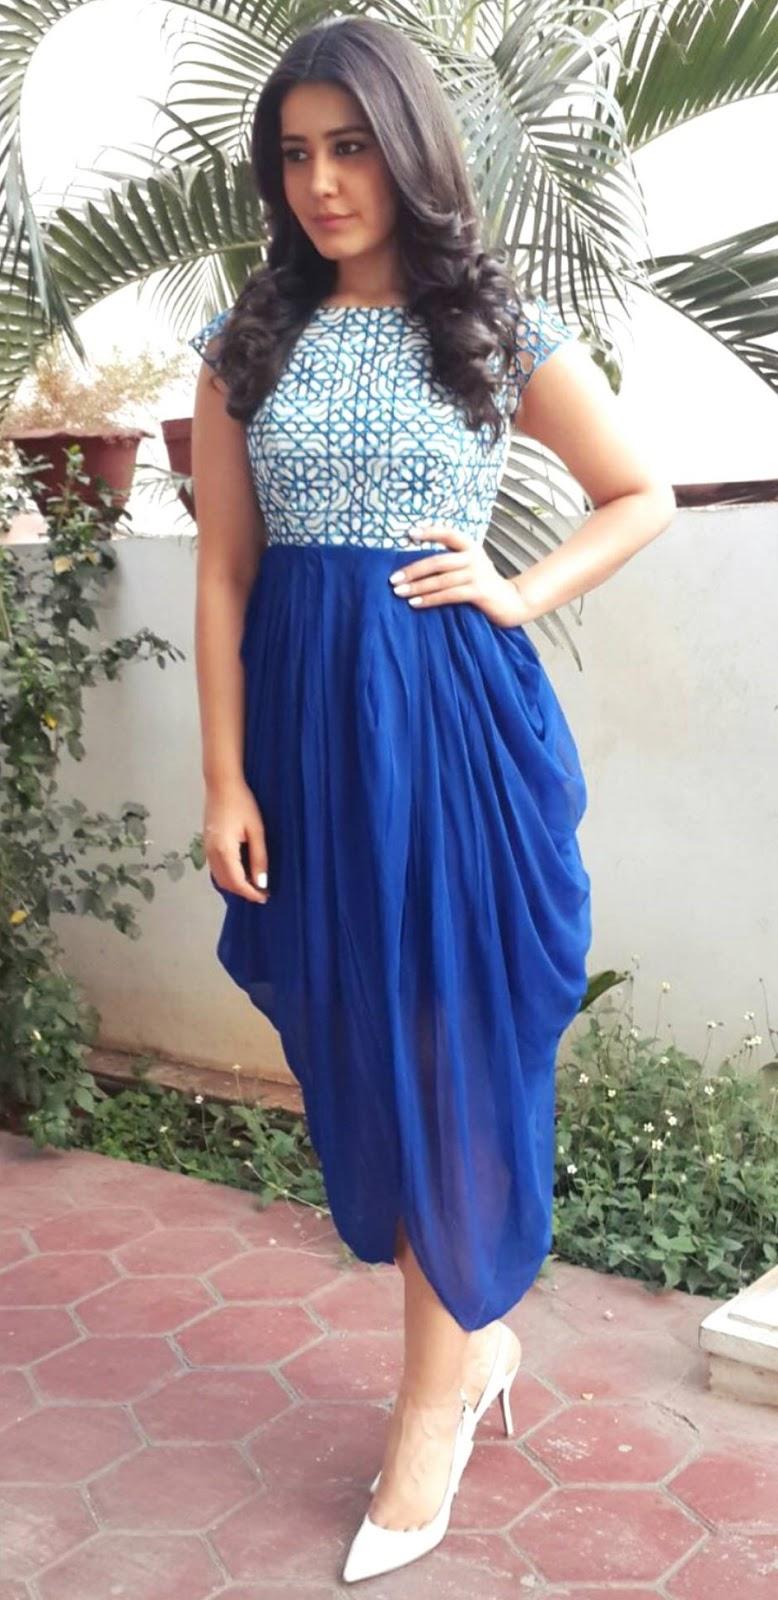 Spicy Photoshoot Of Rashi Khanna In Blue Dress